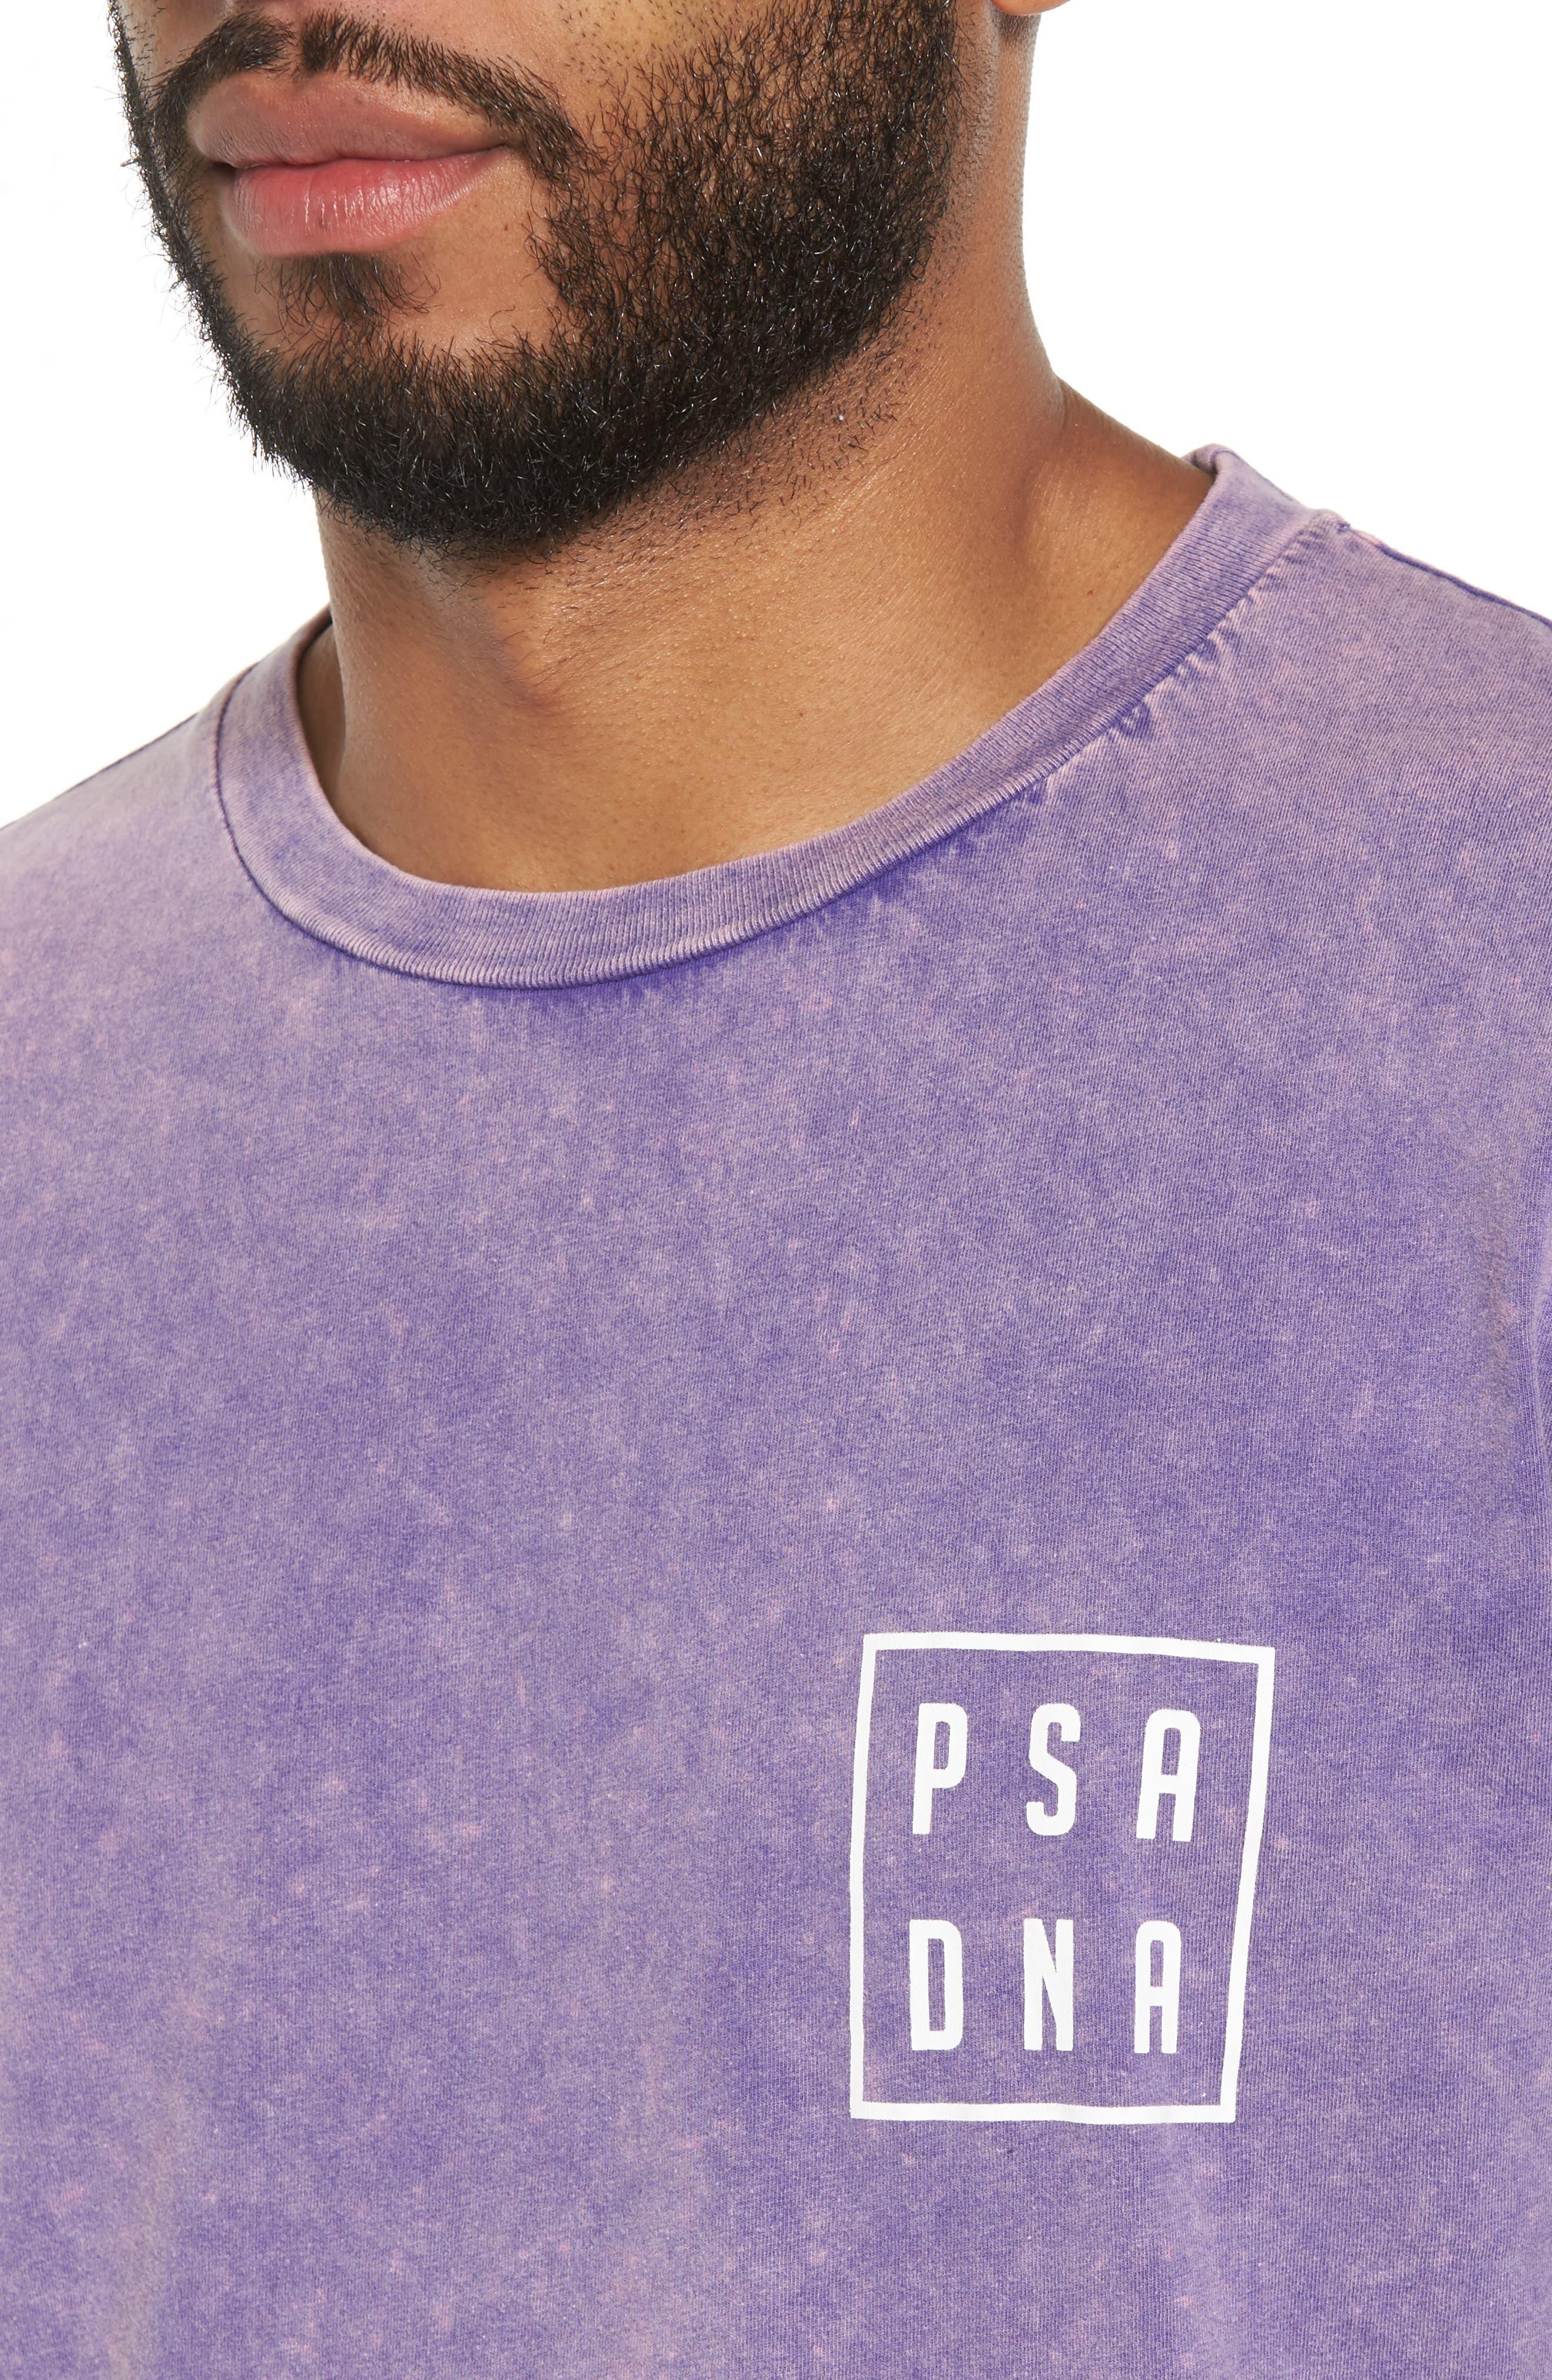 Raiden T-Shirt,                             Alternate thumbnail 4, color,                             540